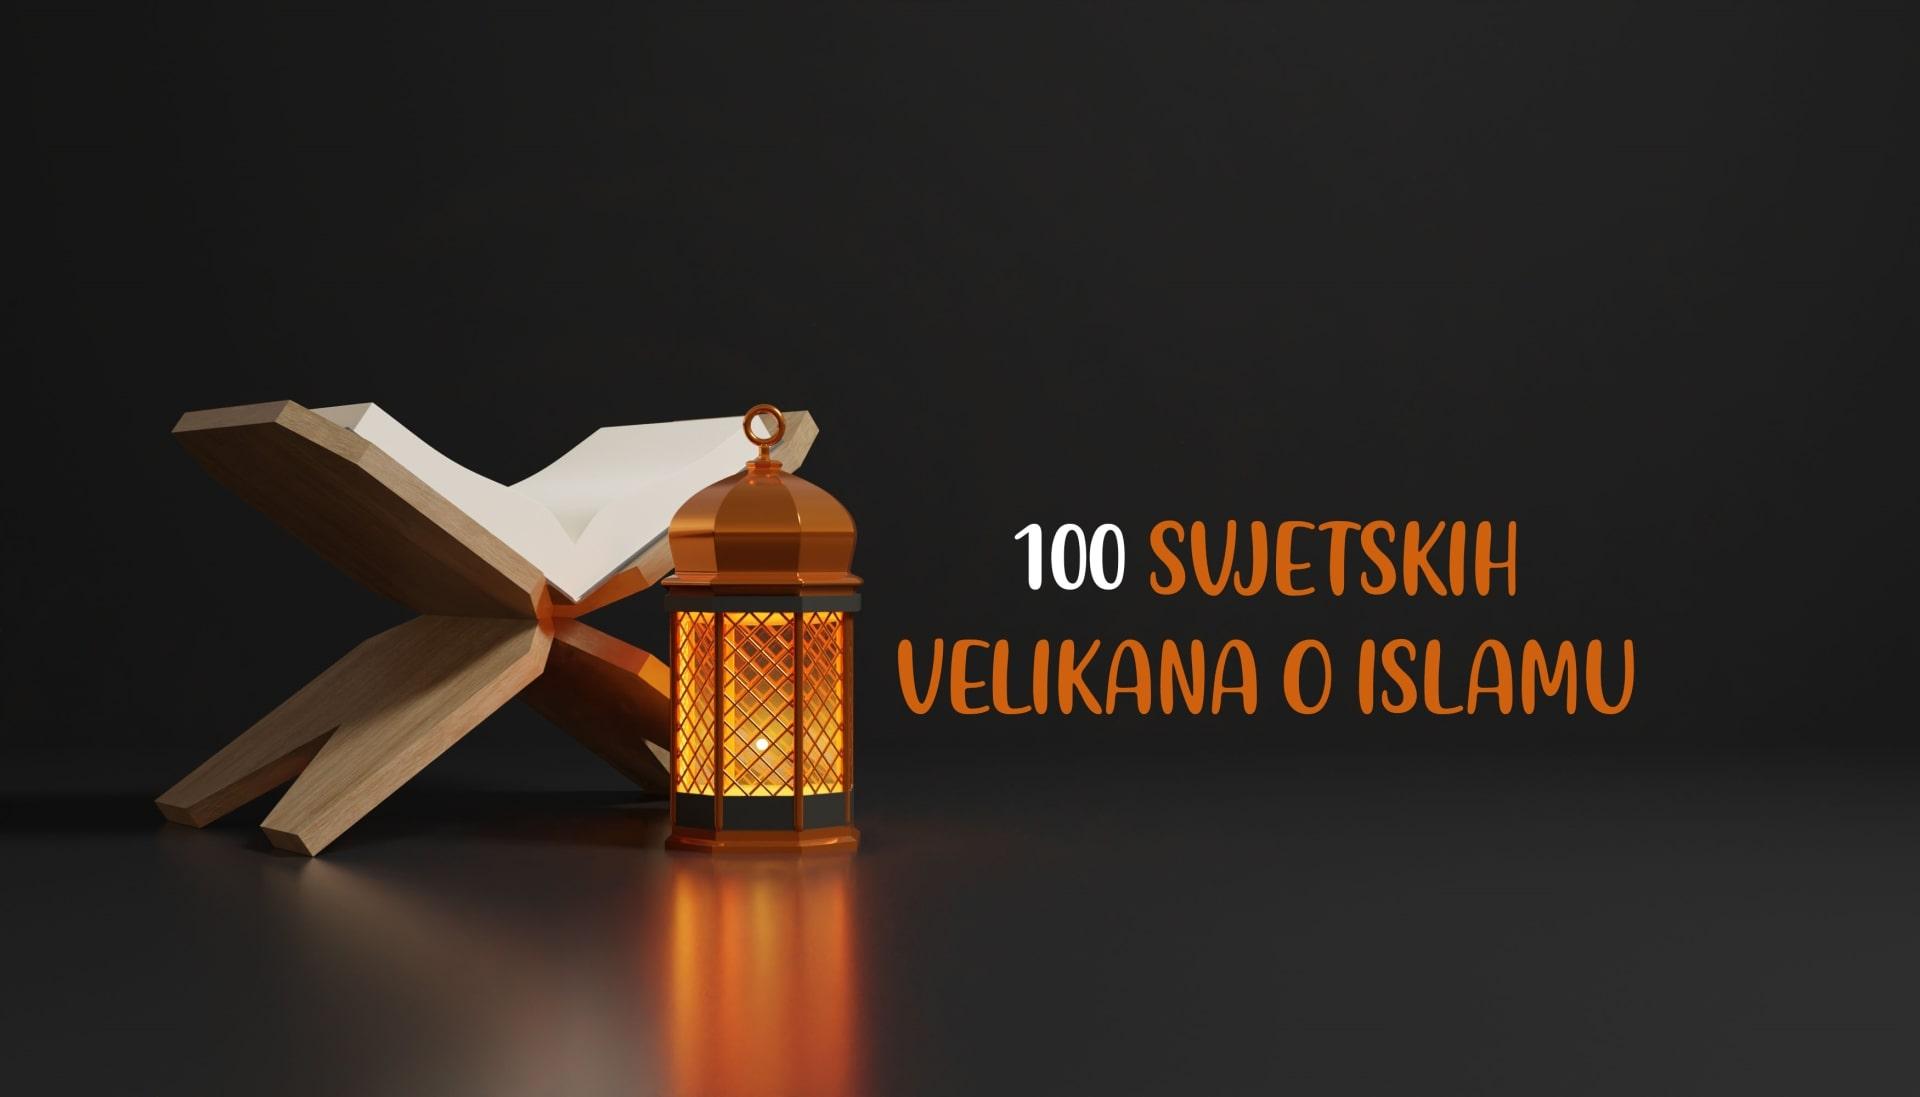 100 svjetskih velikana o islamu – Džordž Margoliet Poučne priče El-Kelimeh Islamska literatura Islamske knjige